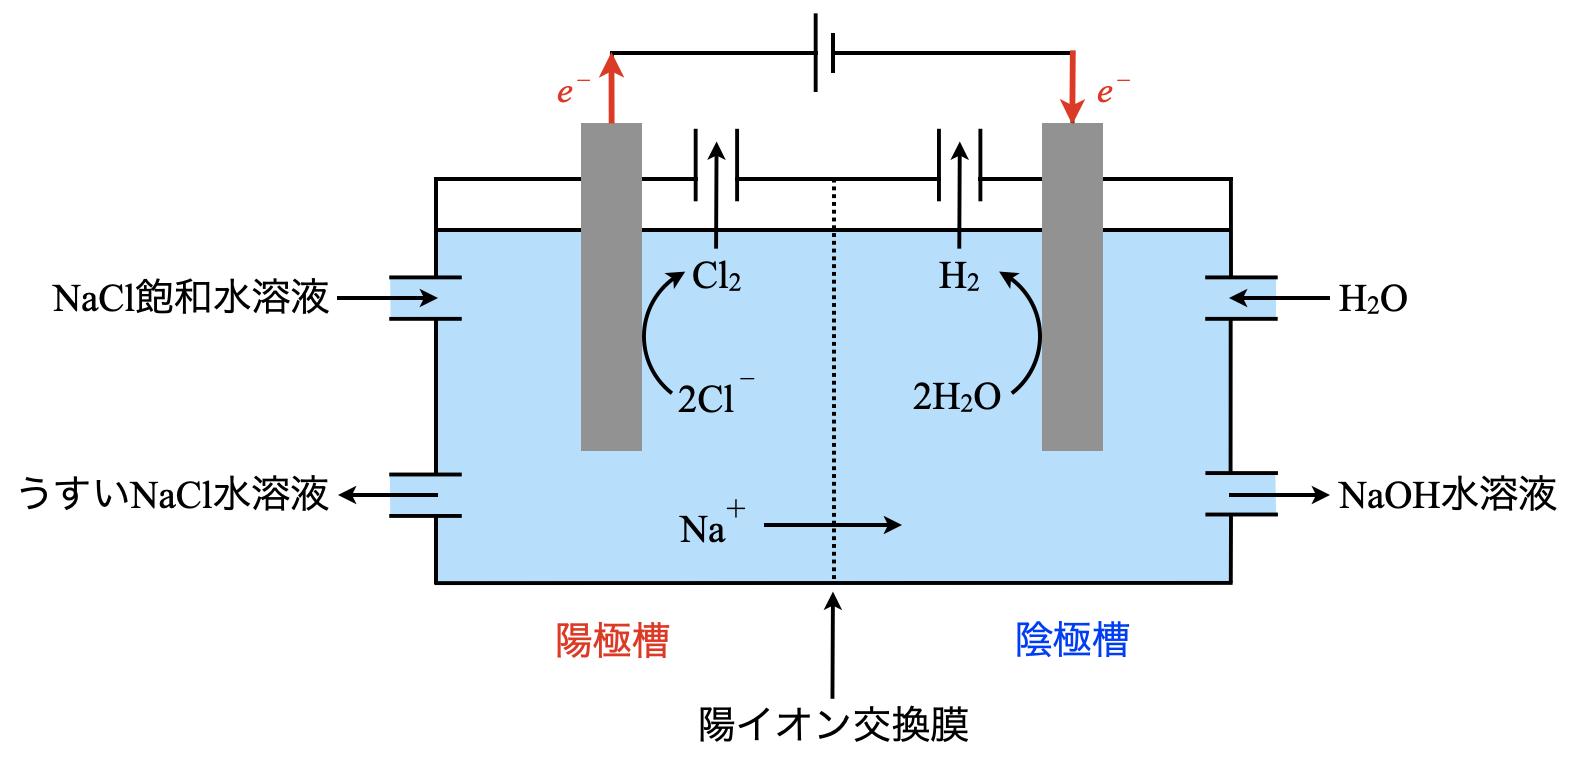 electrolysis of sodium chloride